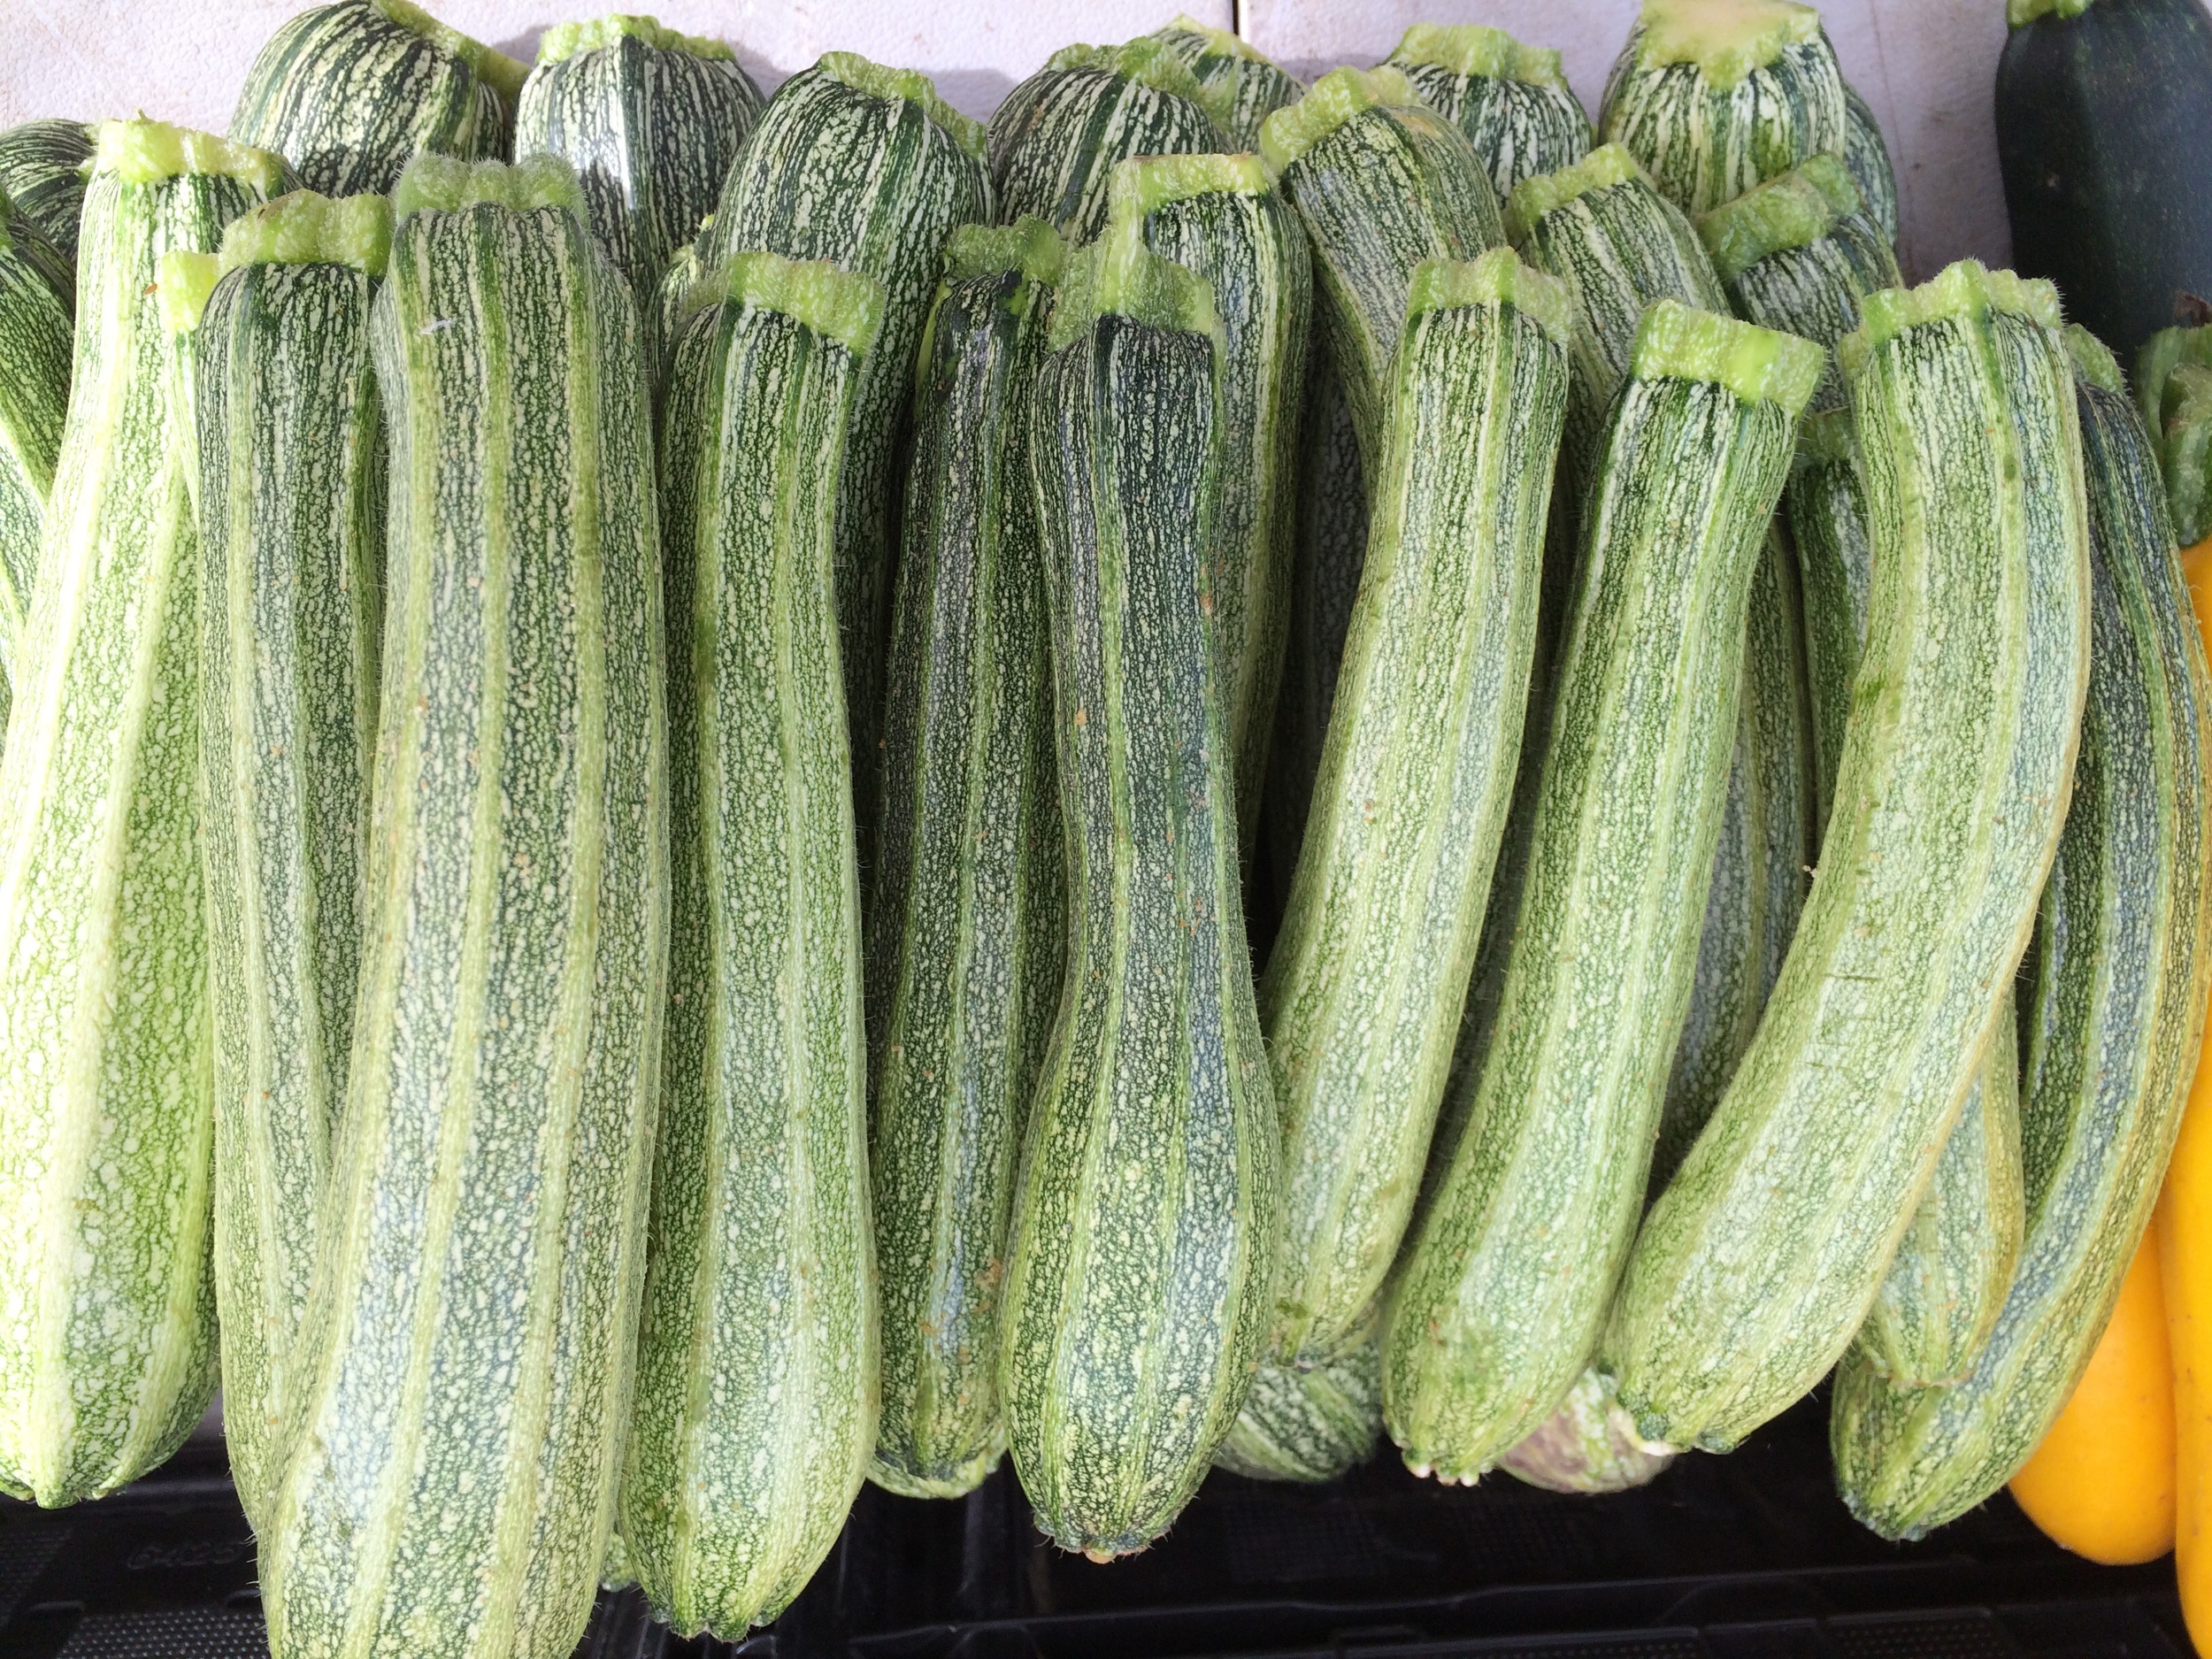 Oya Organics squash @ Mountain View farmers market.jpg